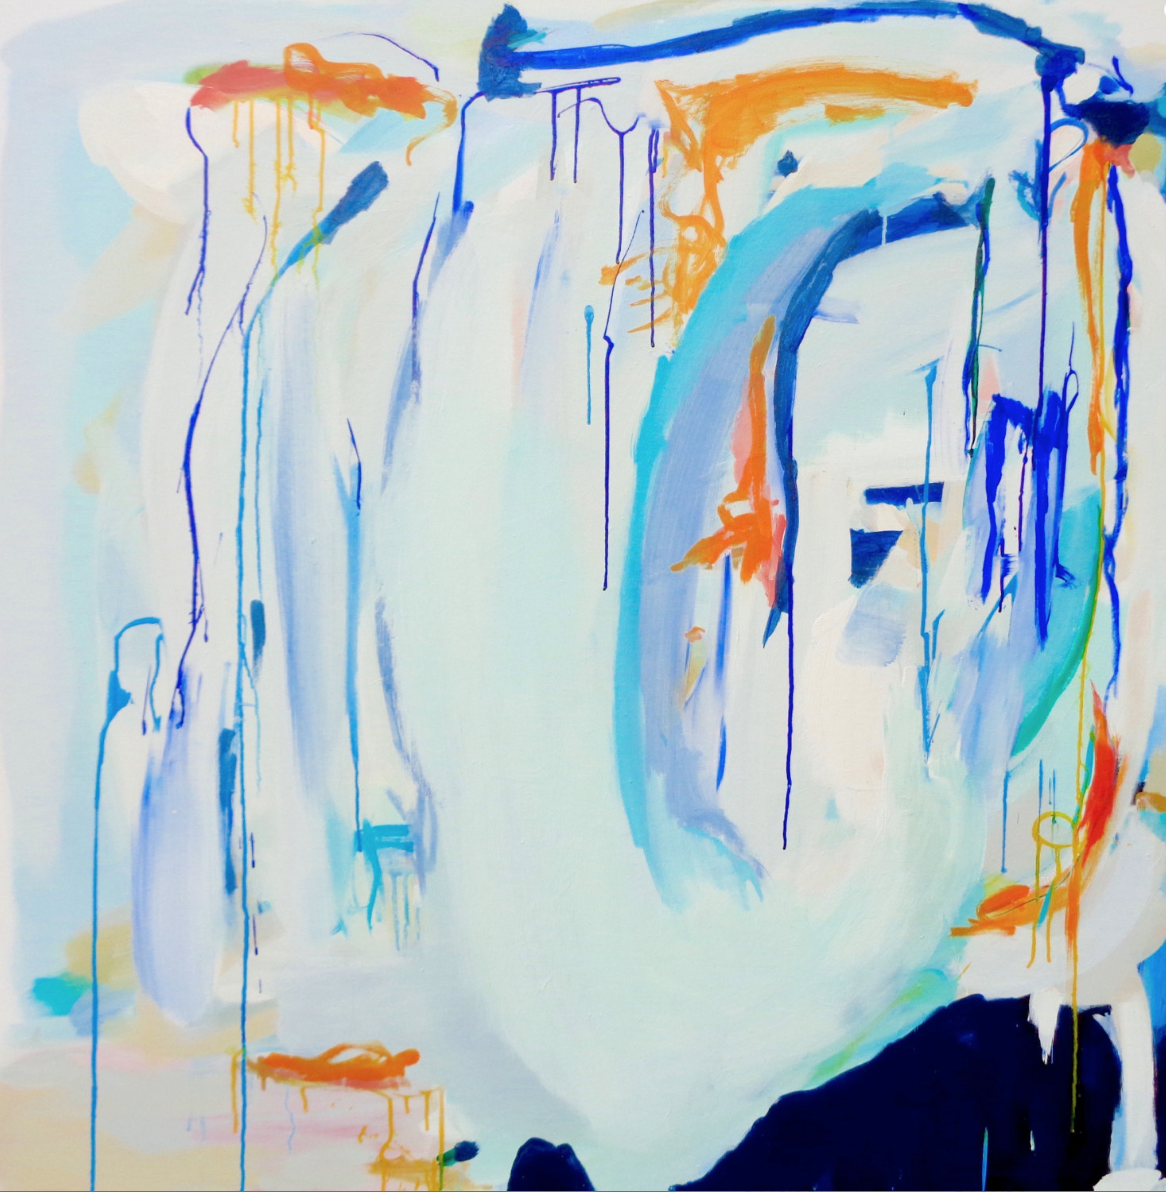 a. Artwork by Susan Skelley